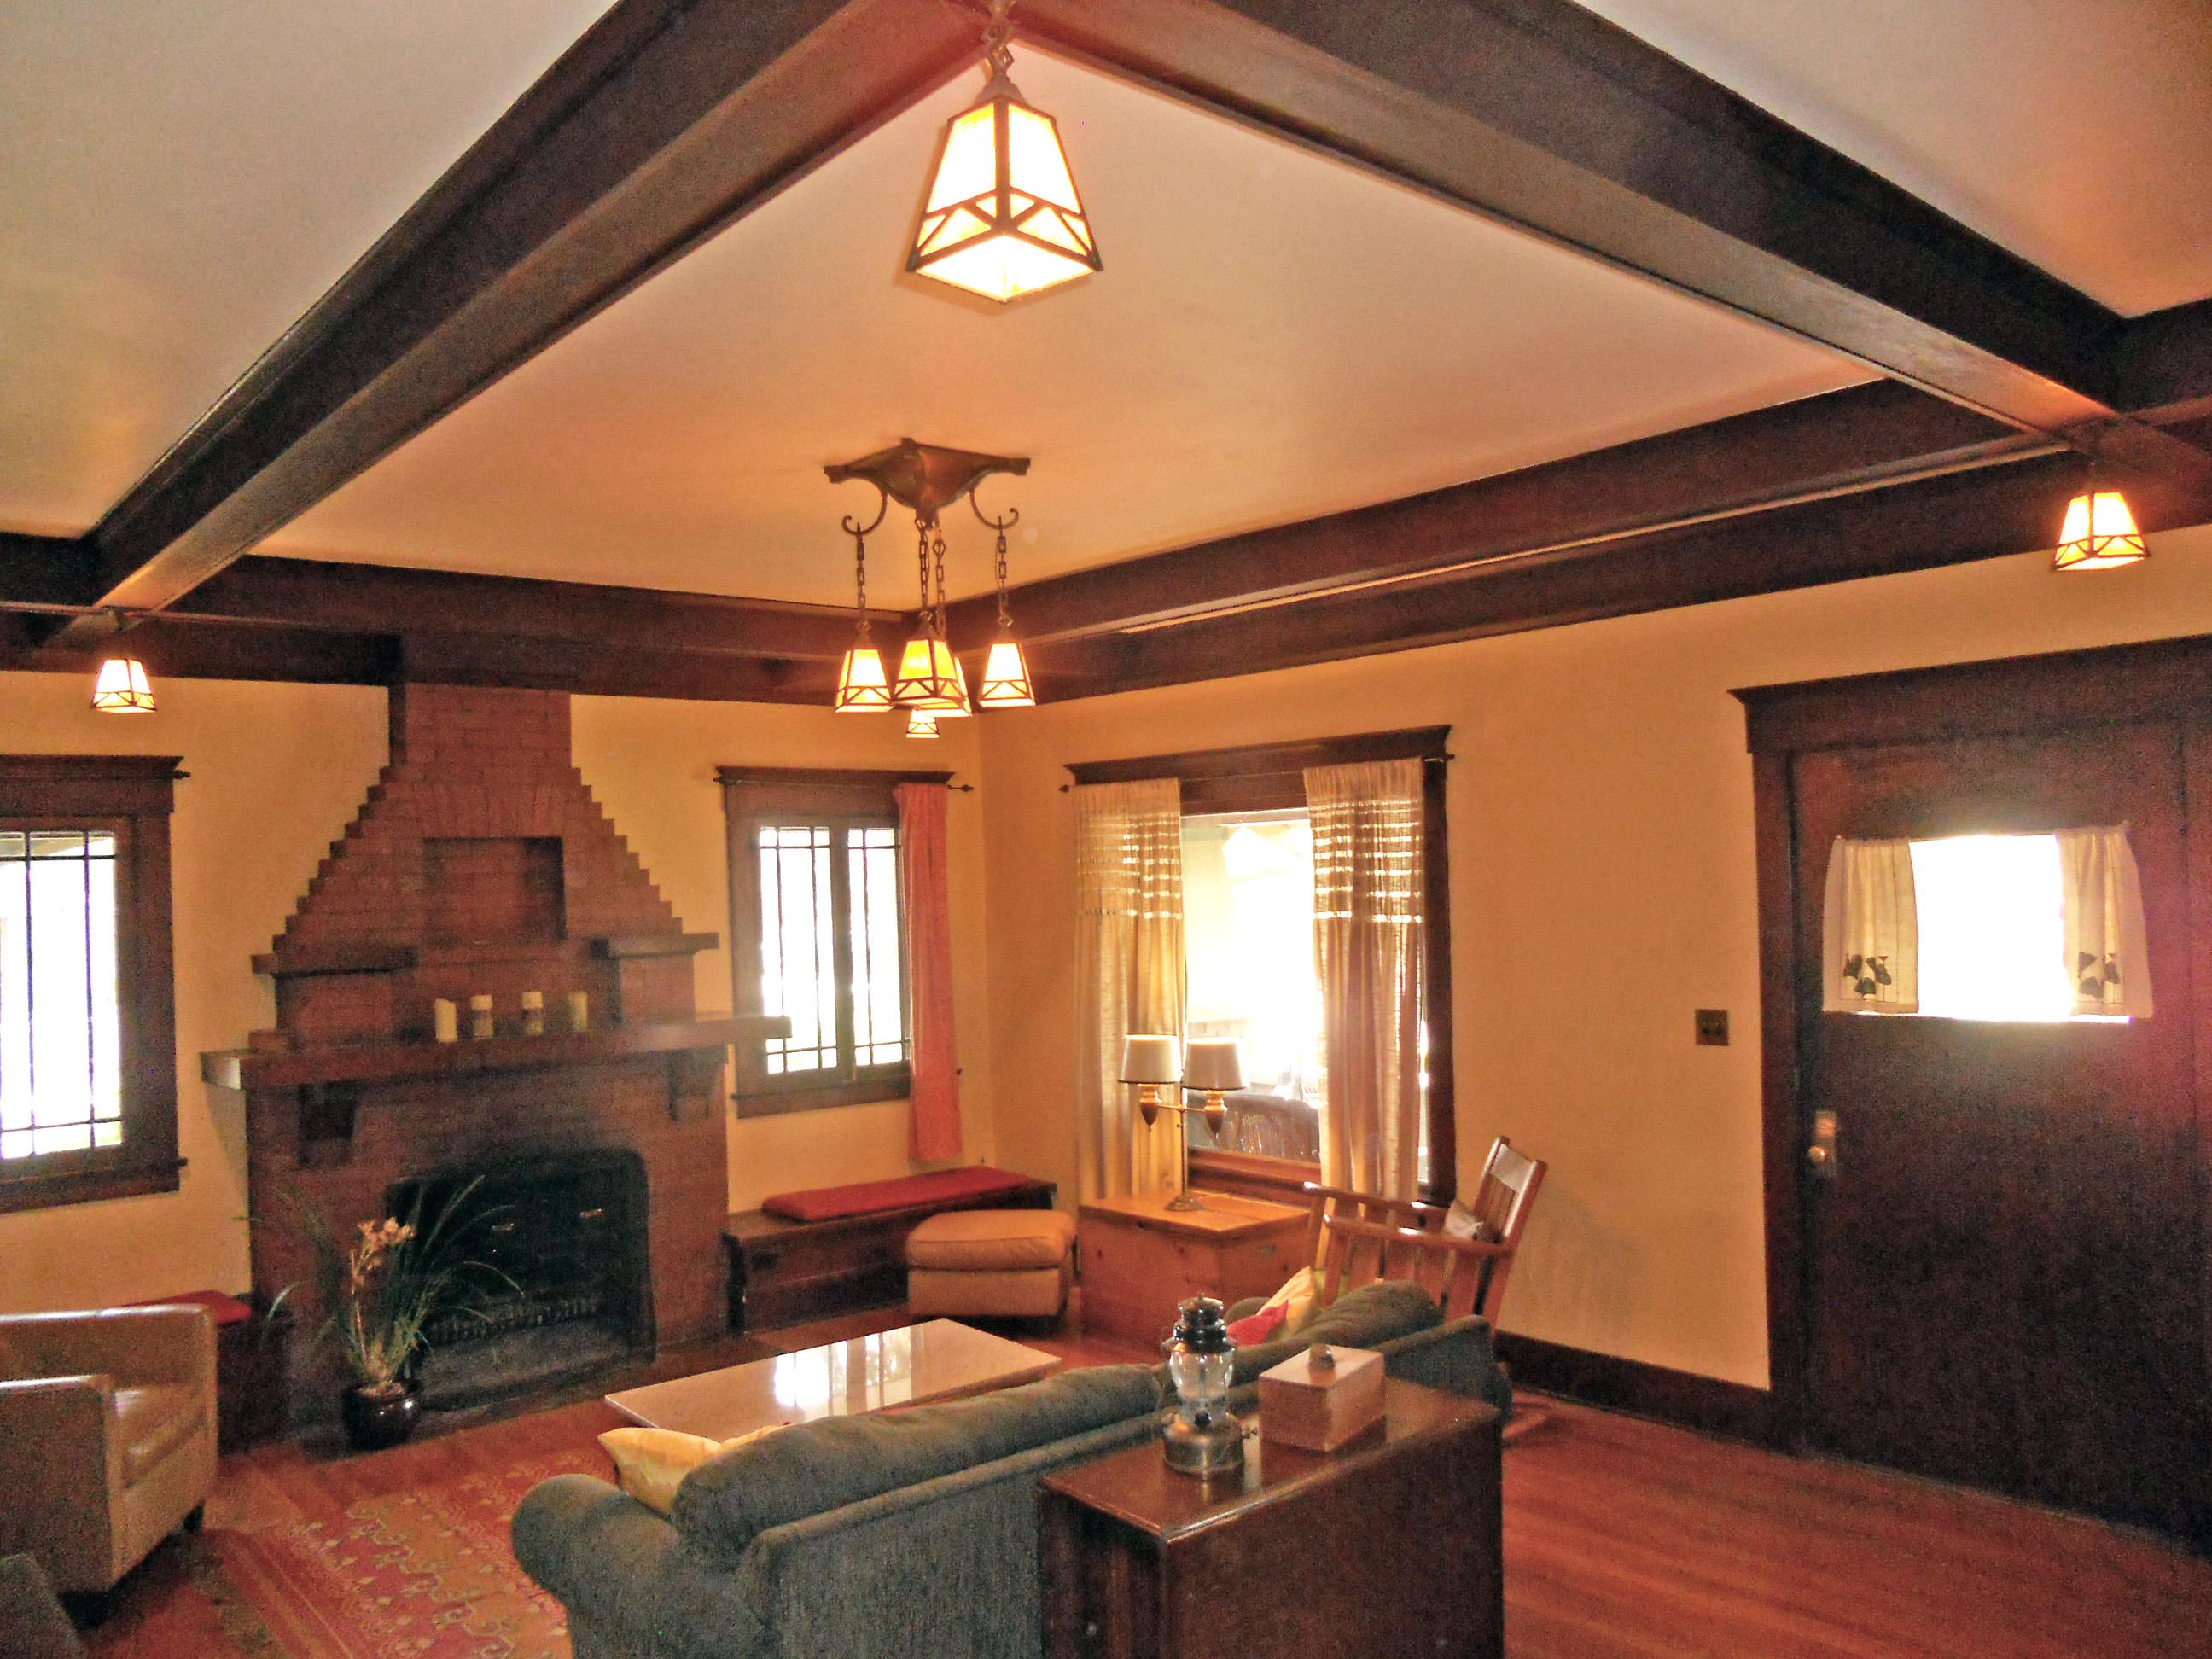 Living room with original hardwood floors, original box beam ceiling with the original light fixtures! Window seats too!